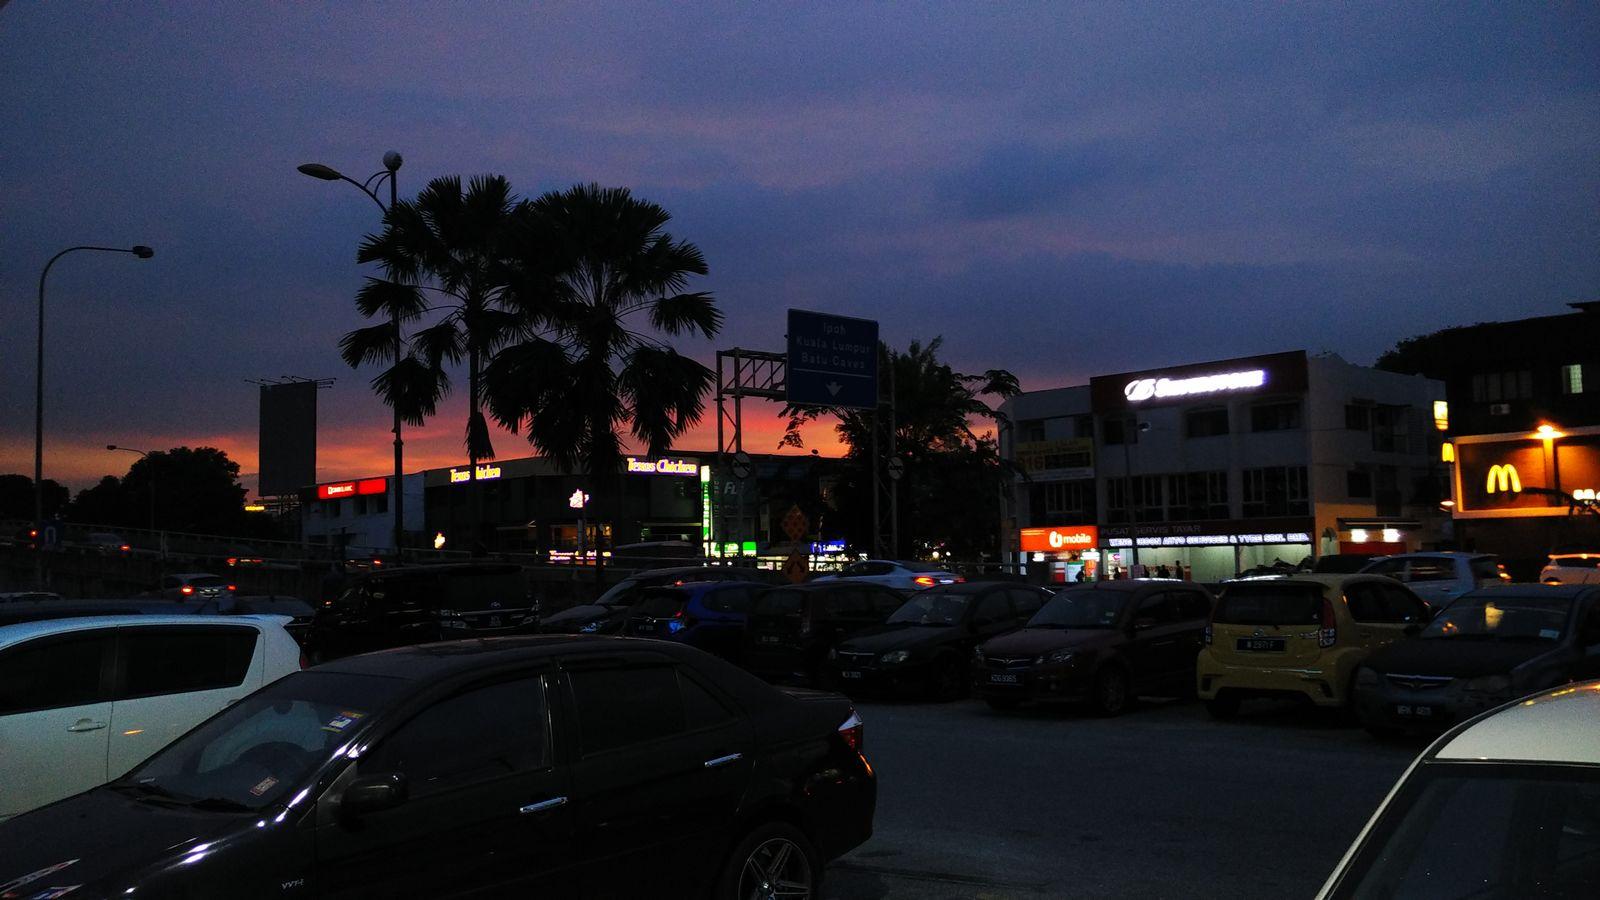 Town, Night, City